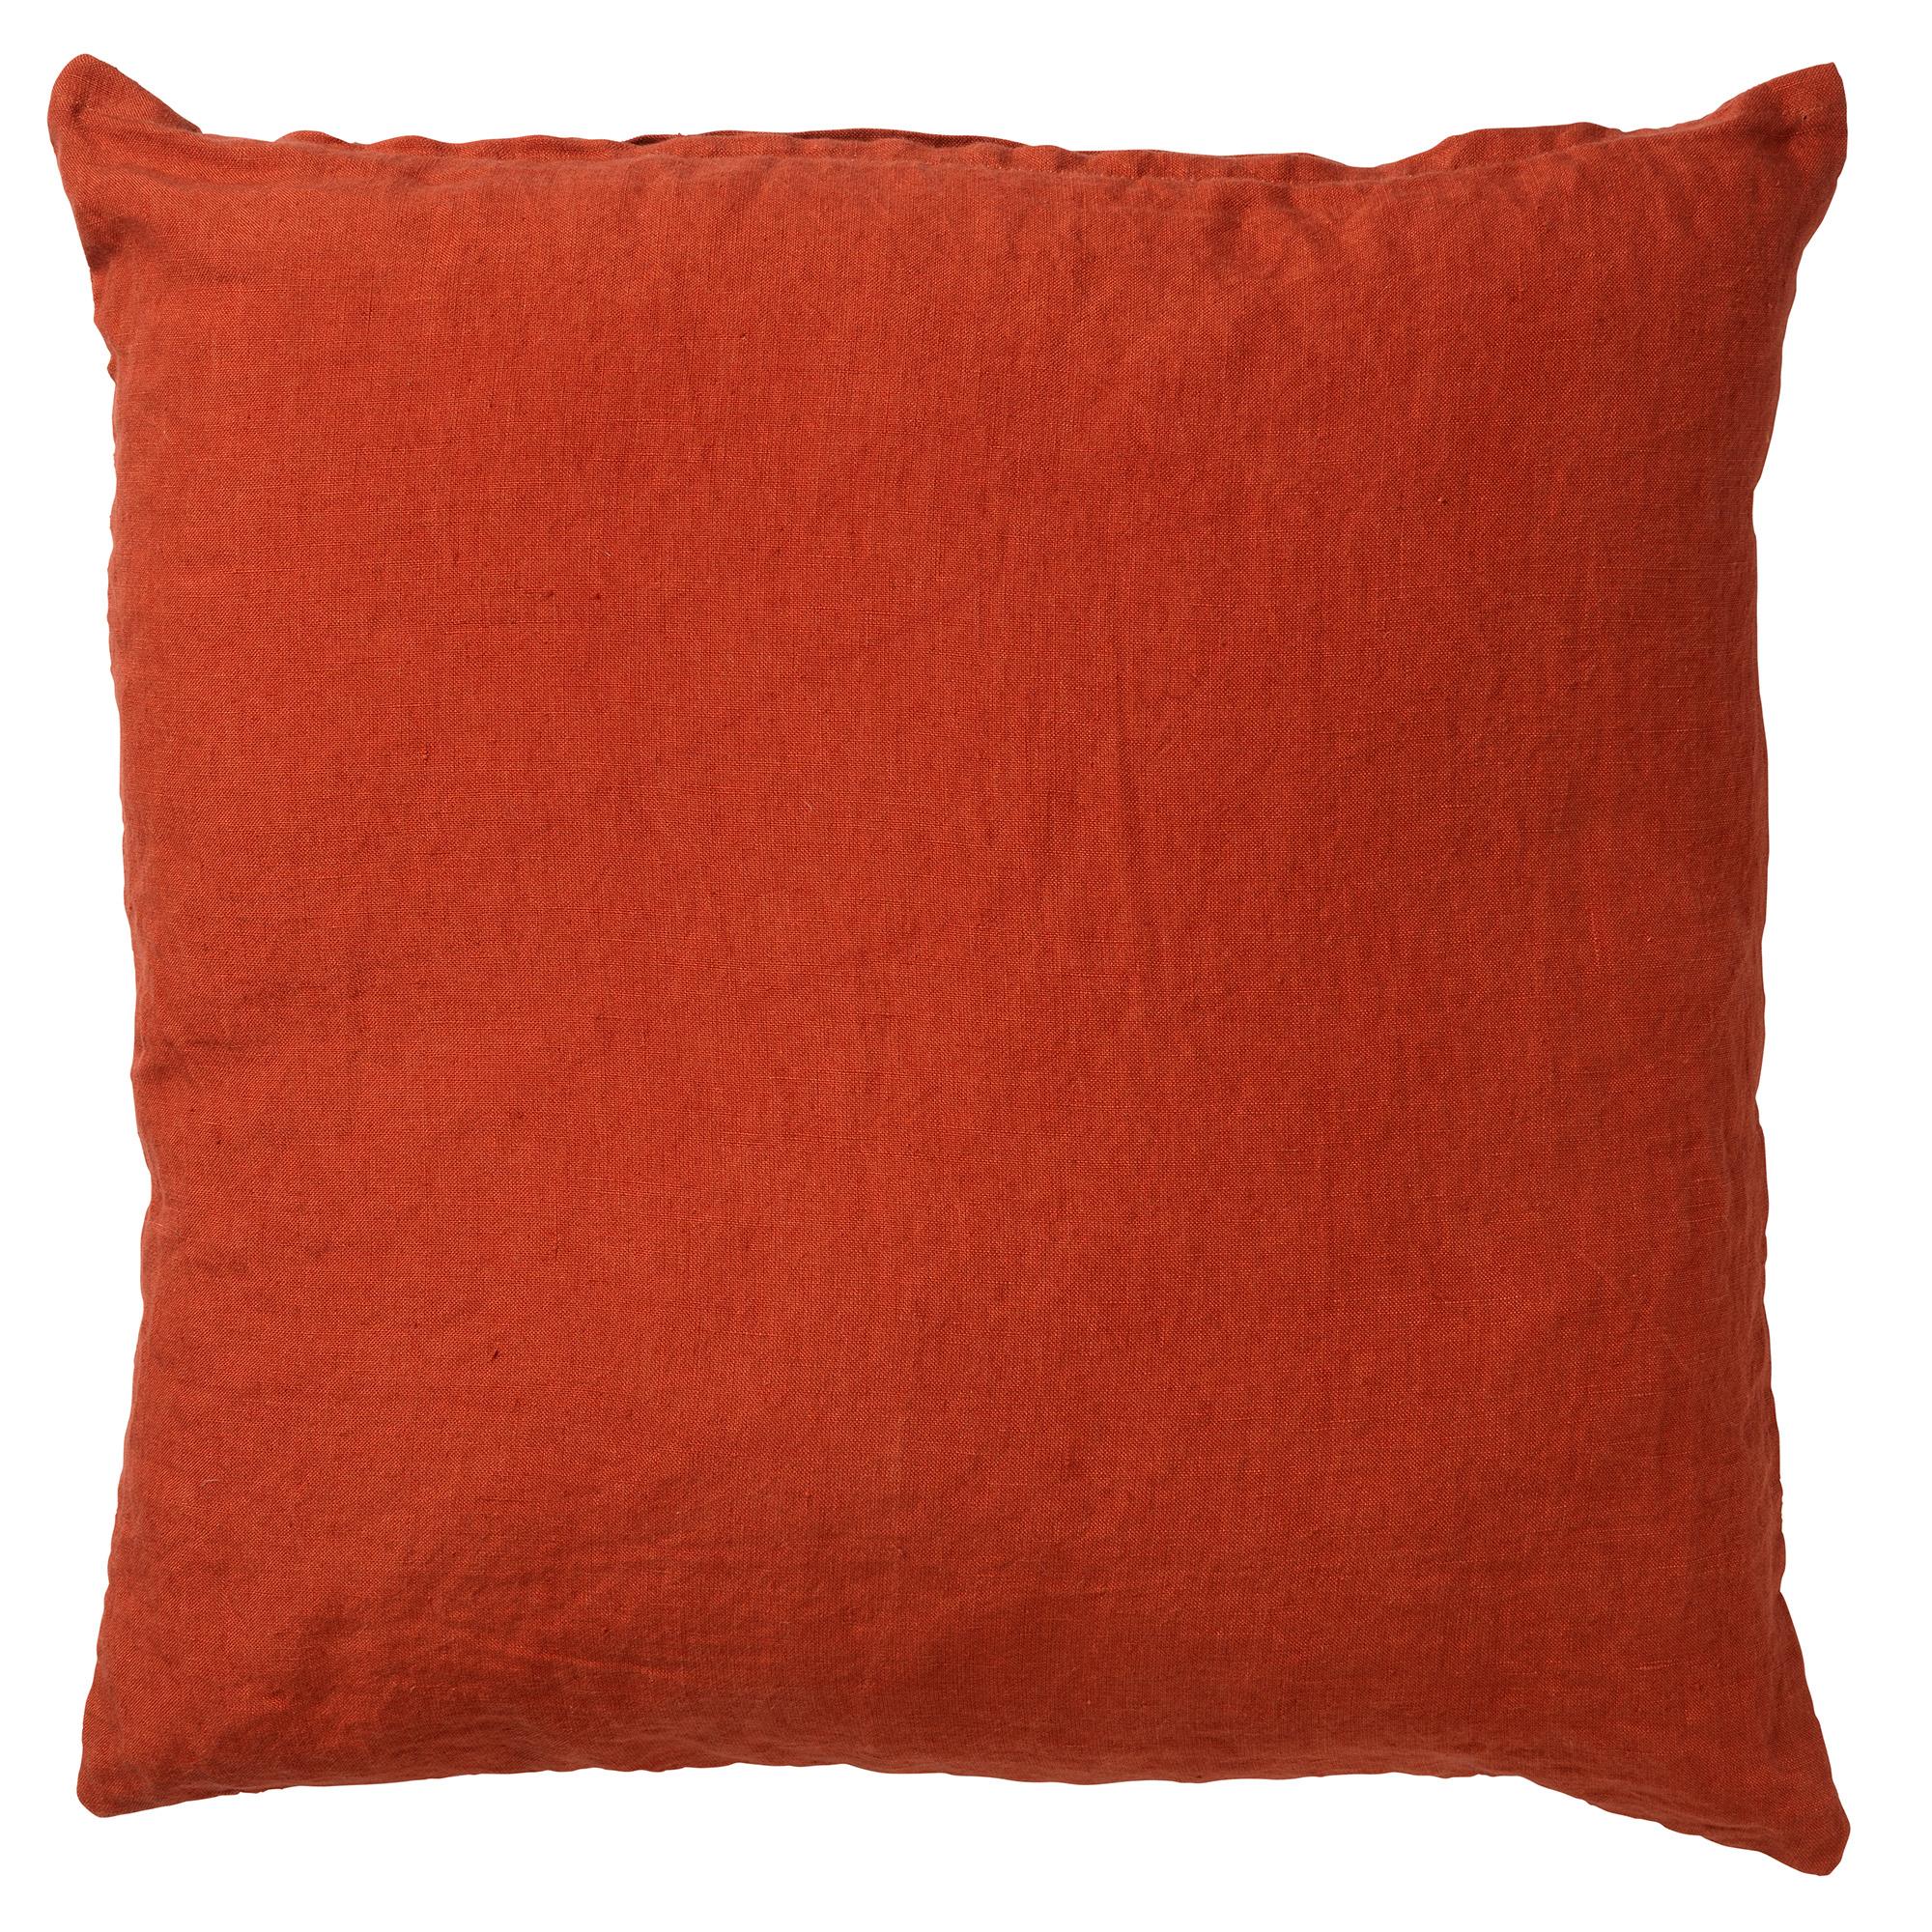 LINN - Sierkussen linnen Potters Clay 45x45 cm